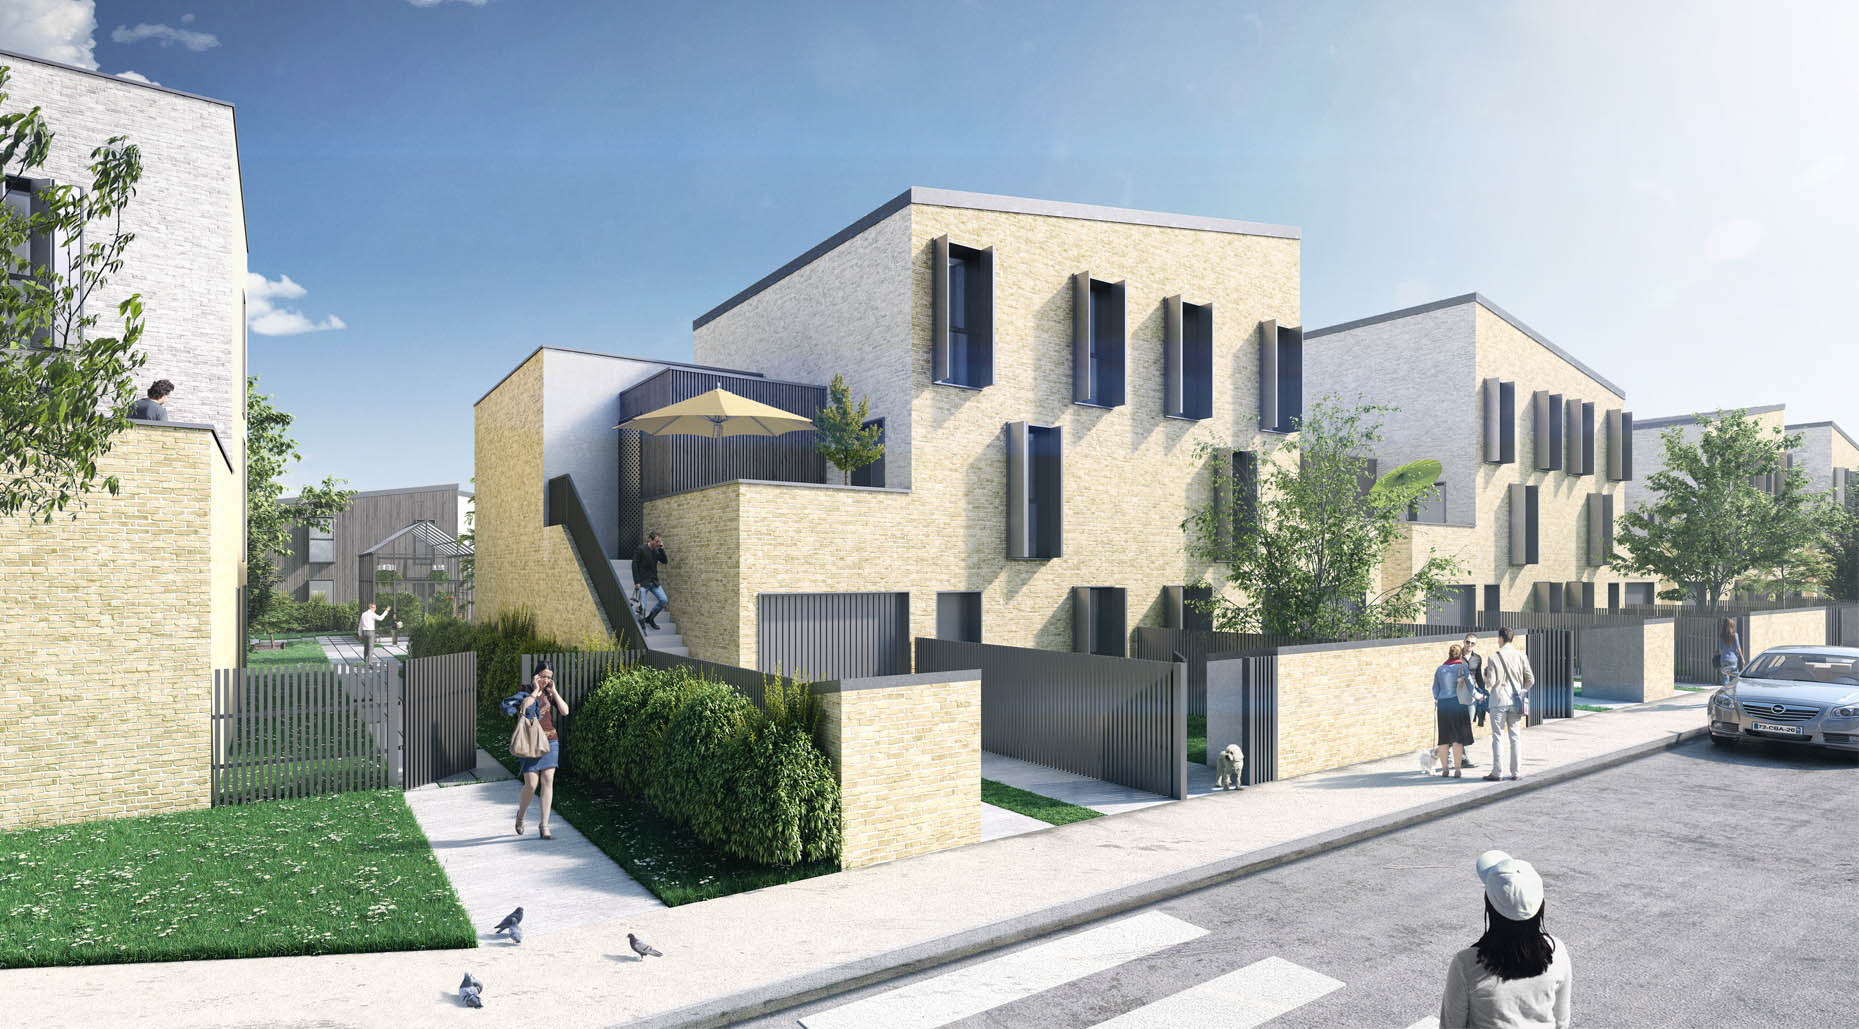 residence-le-golden-le-havre-cba-2